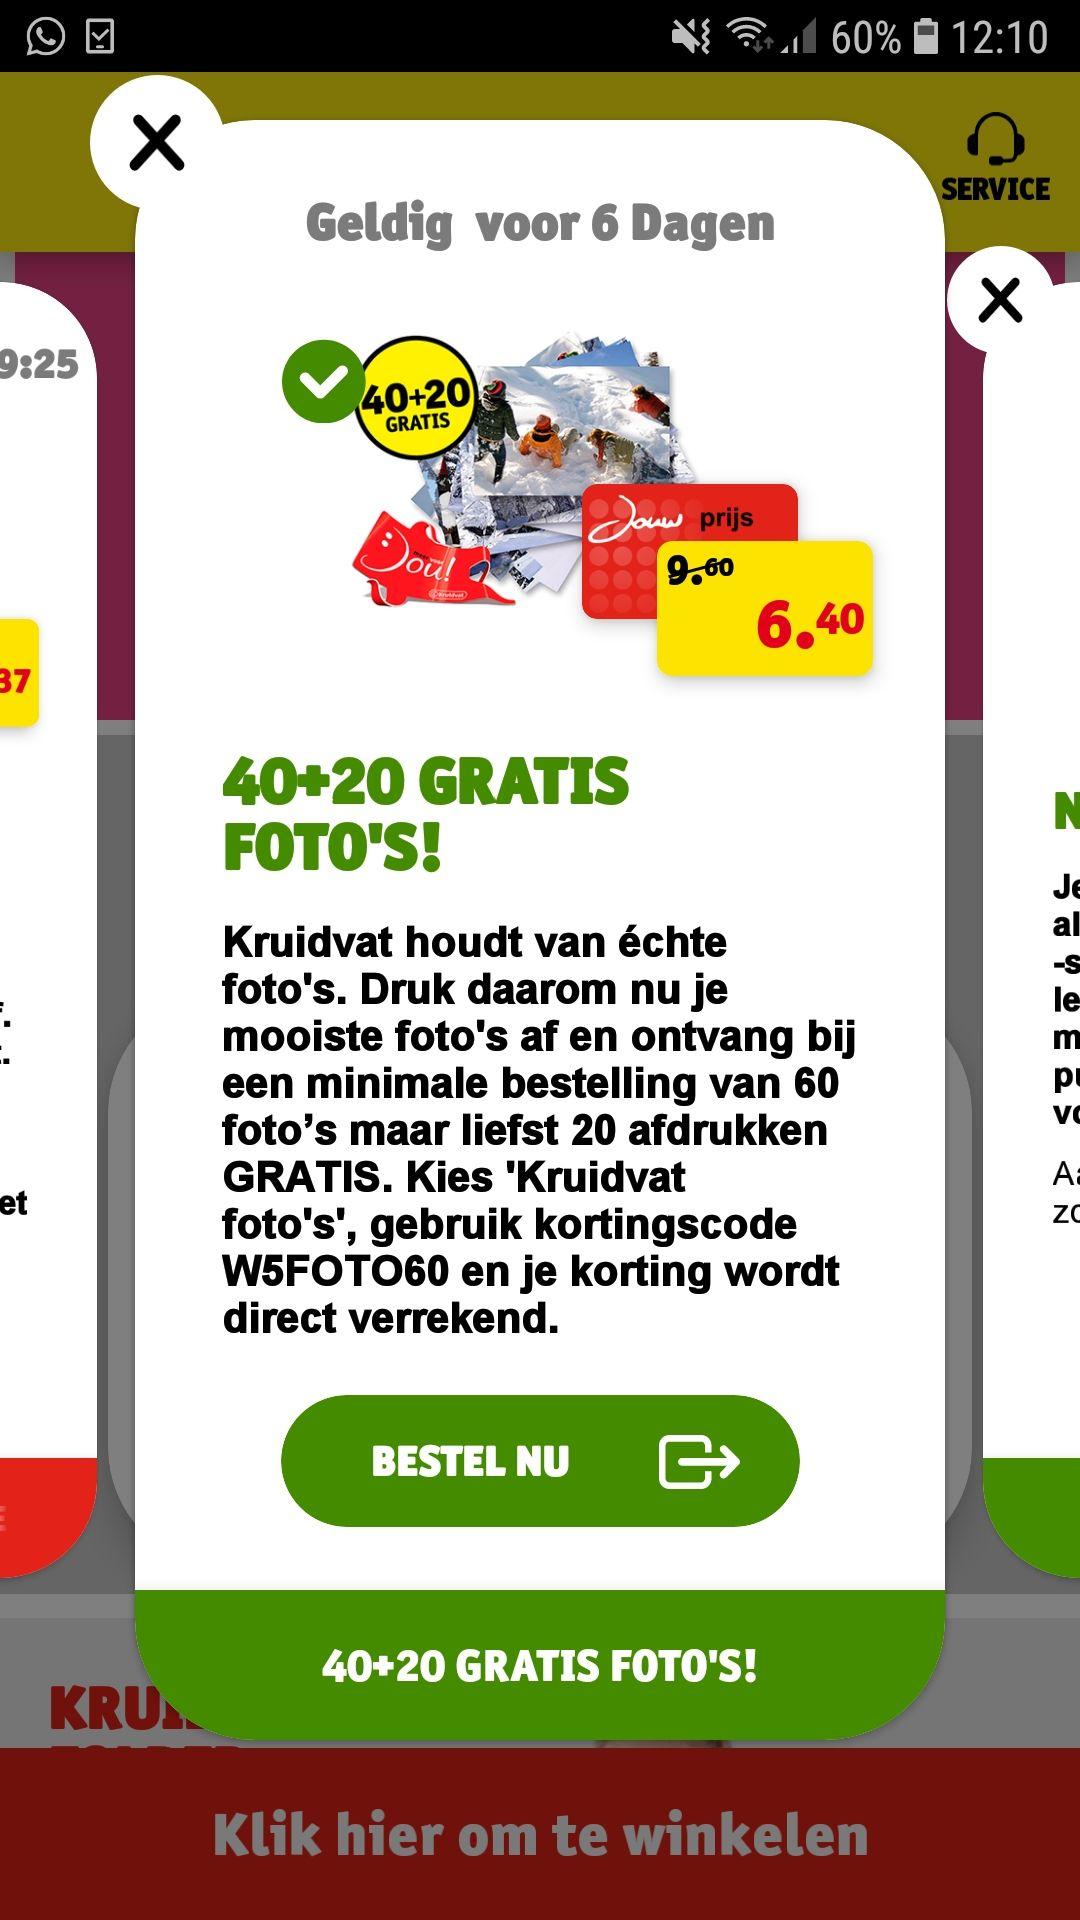 40 + 20 gratis foto's printen op Kruidvat.nl